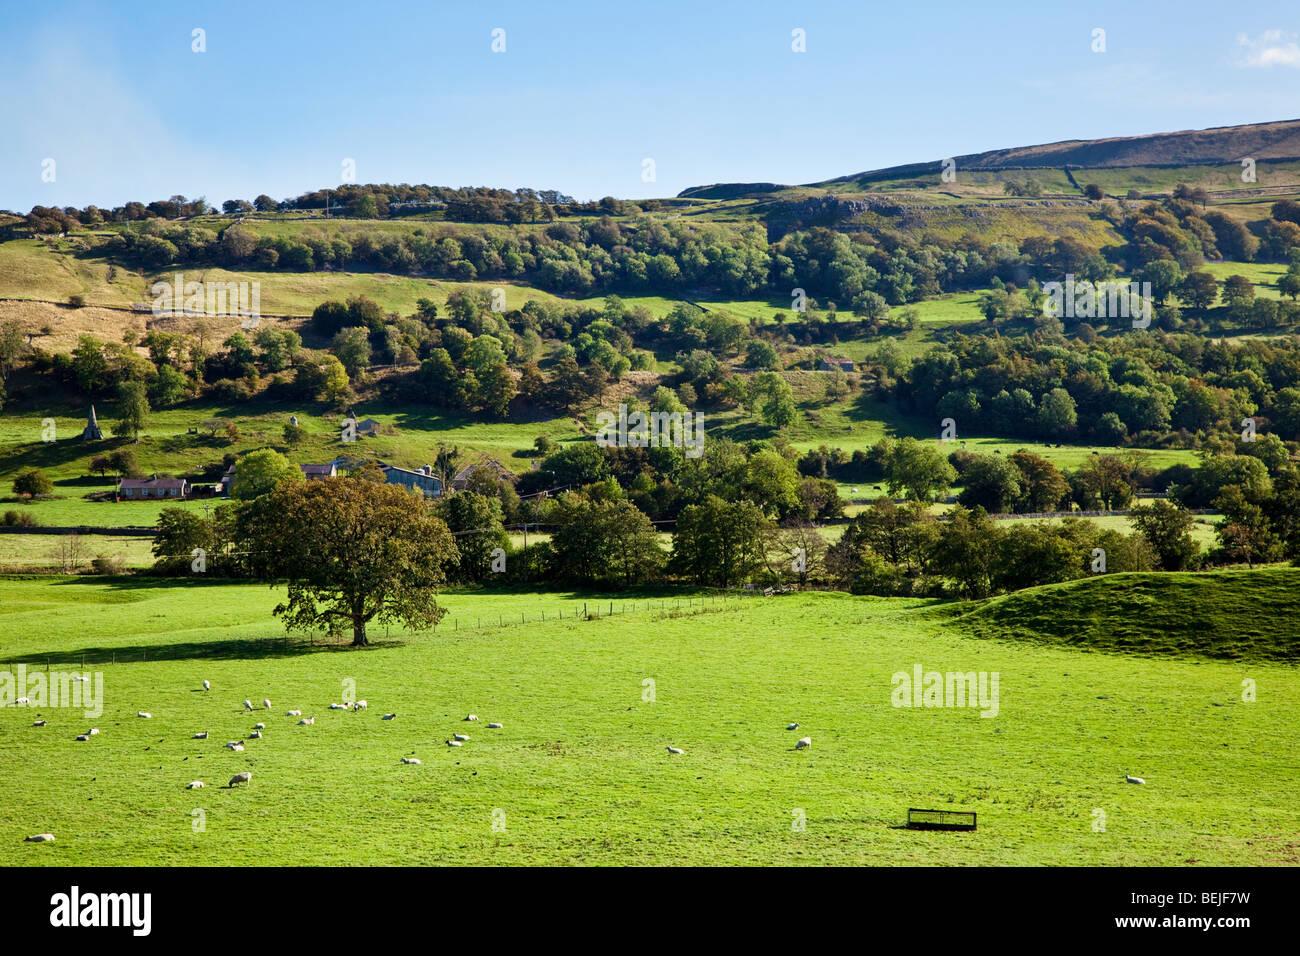 Yorkshire Dales scene in the National Park in autumn Stock Photo